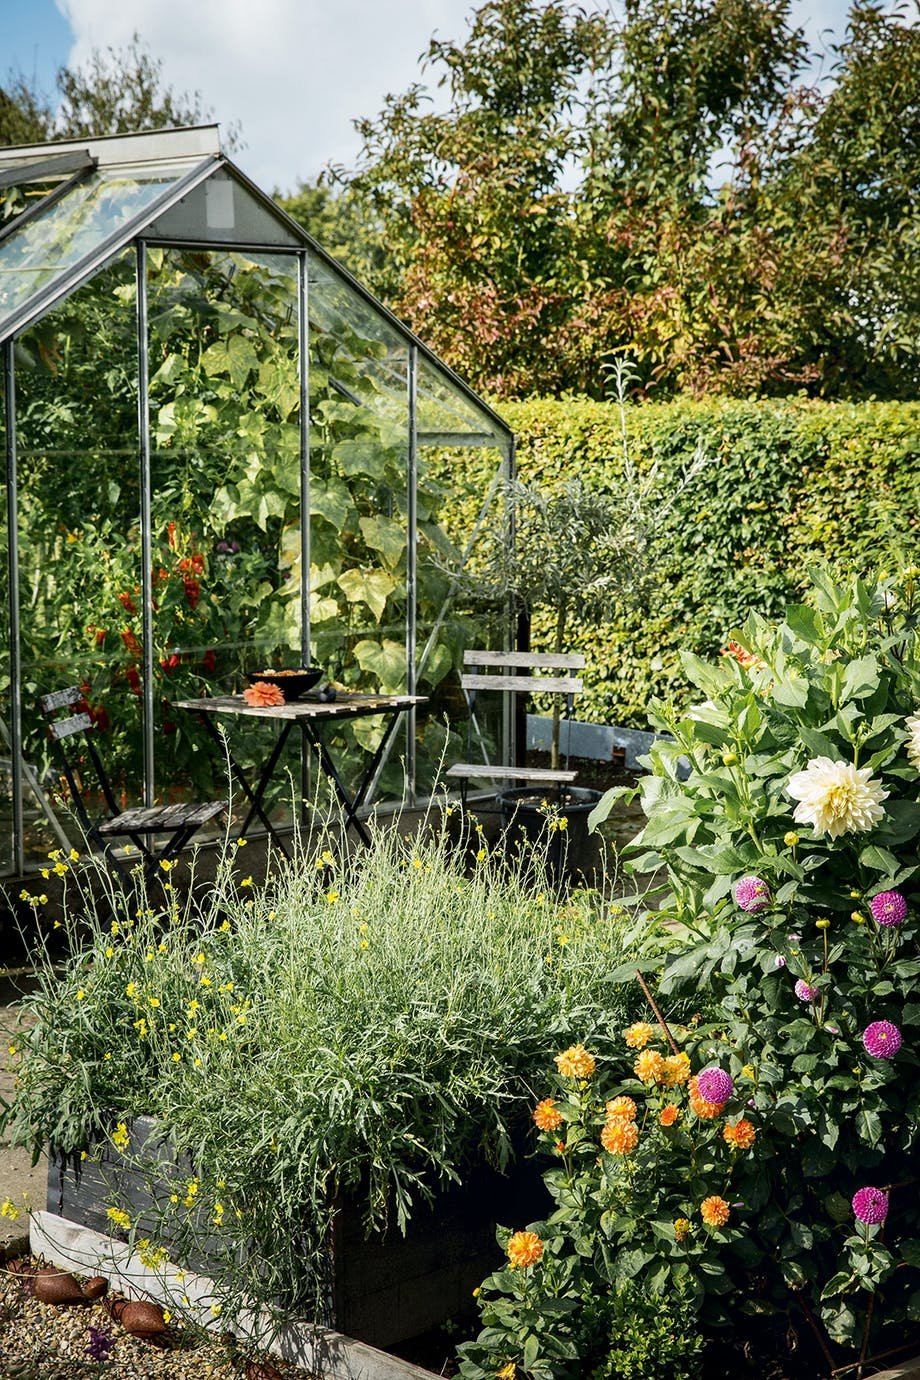 d9386533a En vakker hage med minimalt vedlikehold | Bo-bedre.no